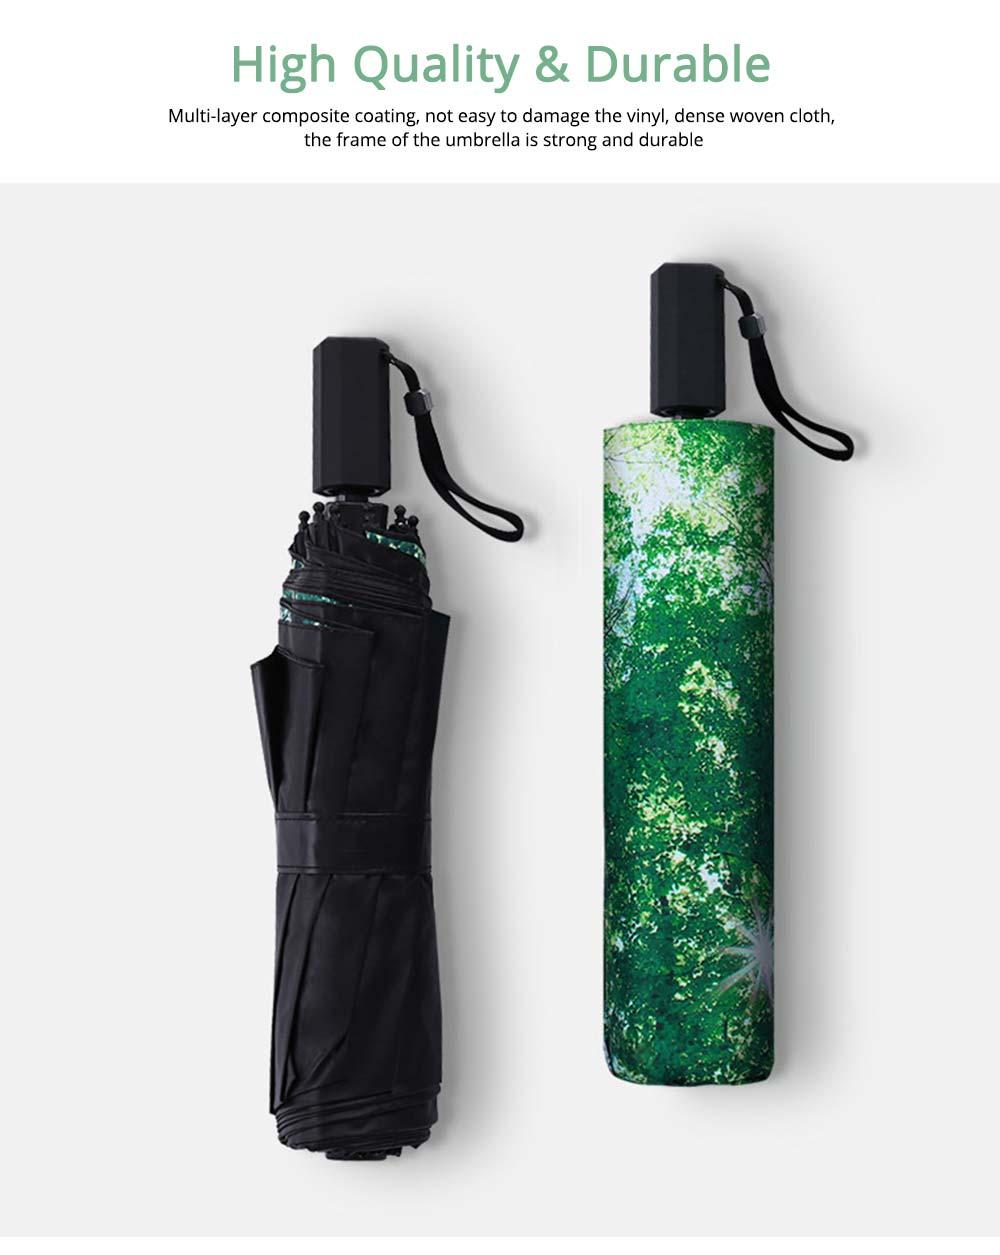 Sun Protection UV Resistant Black Umbrellas - Three Folding 4